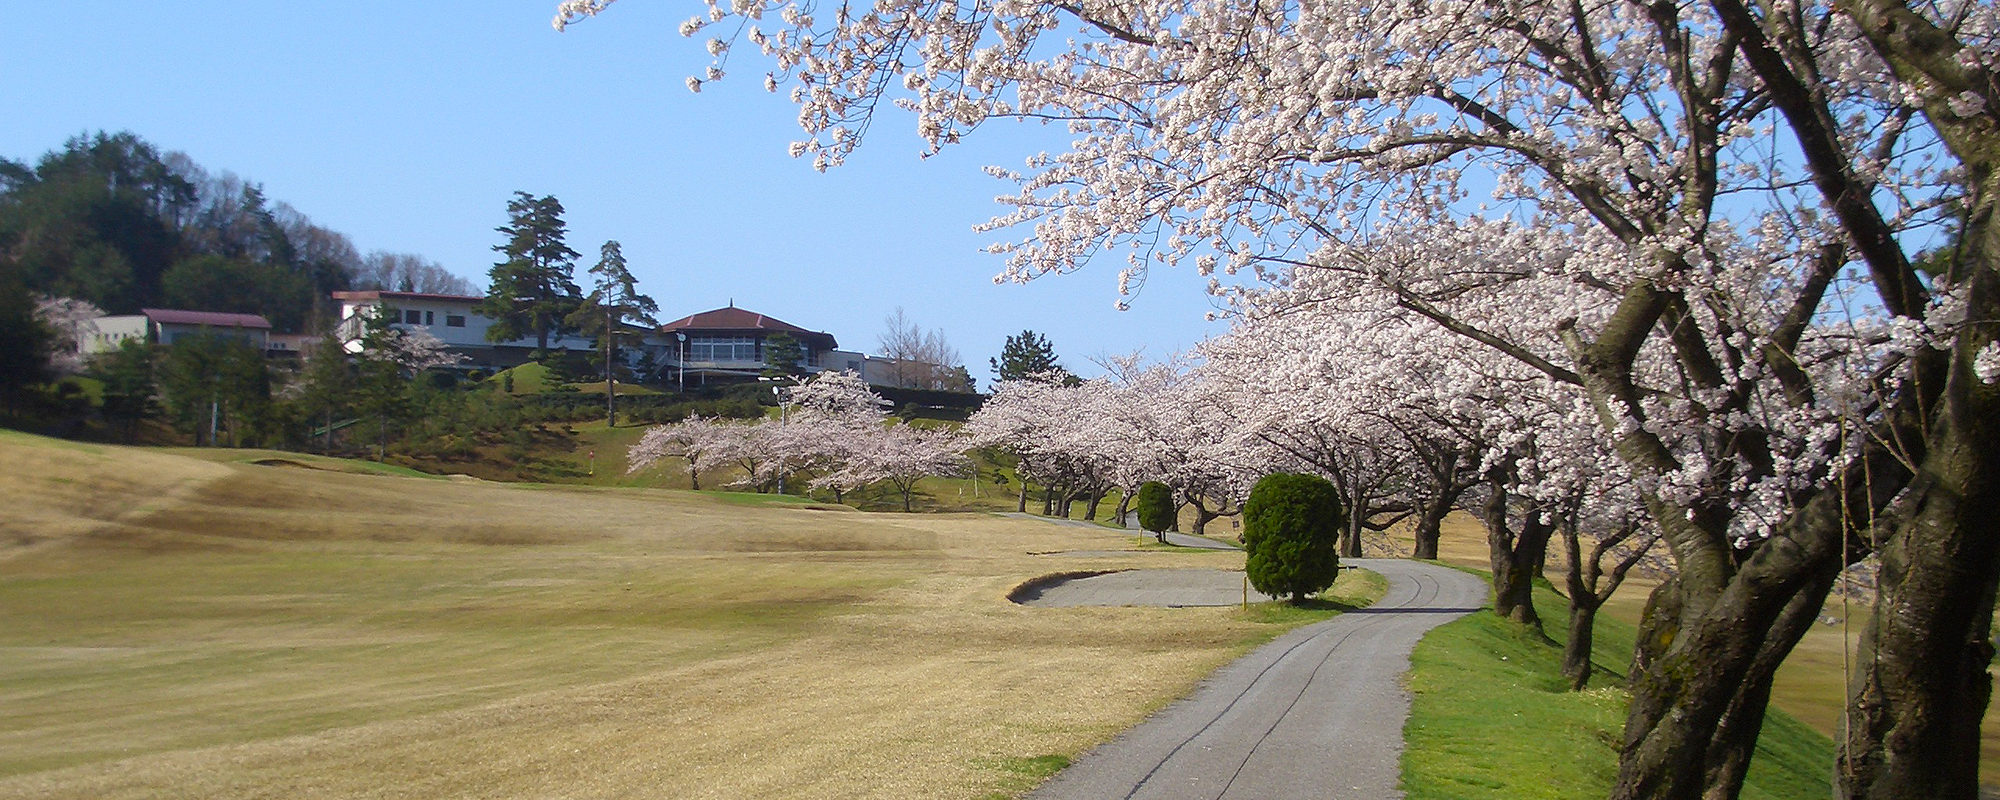 Hole09 桜シーズン